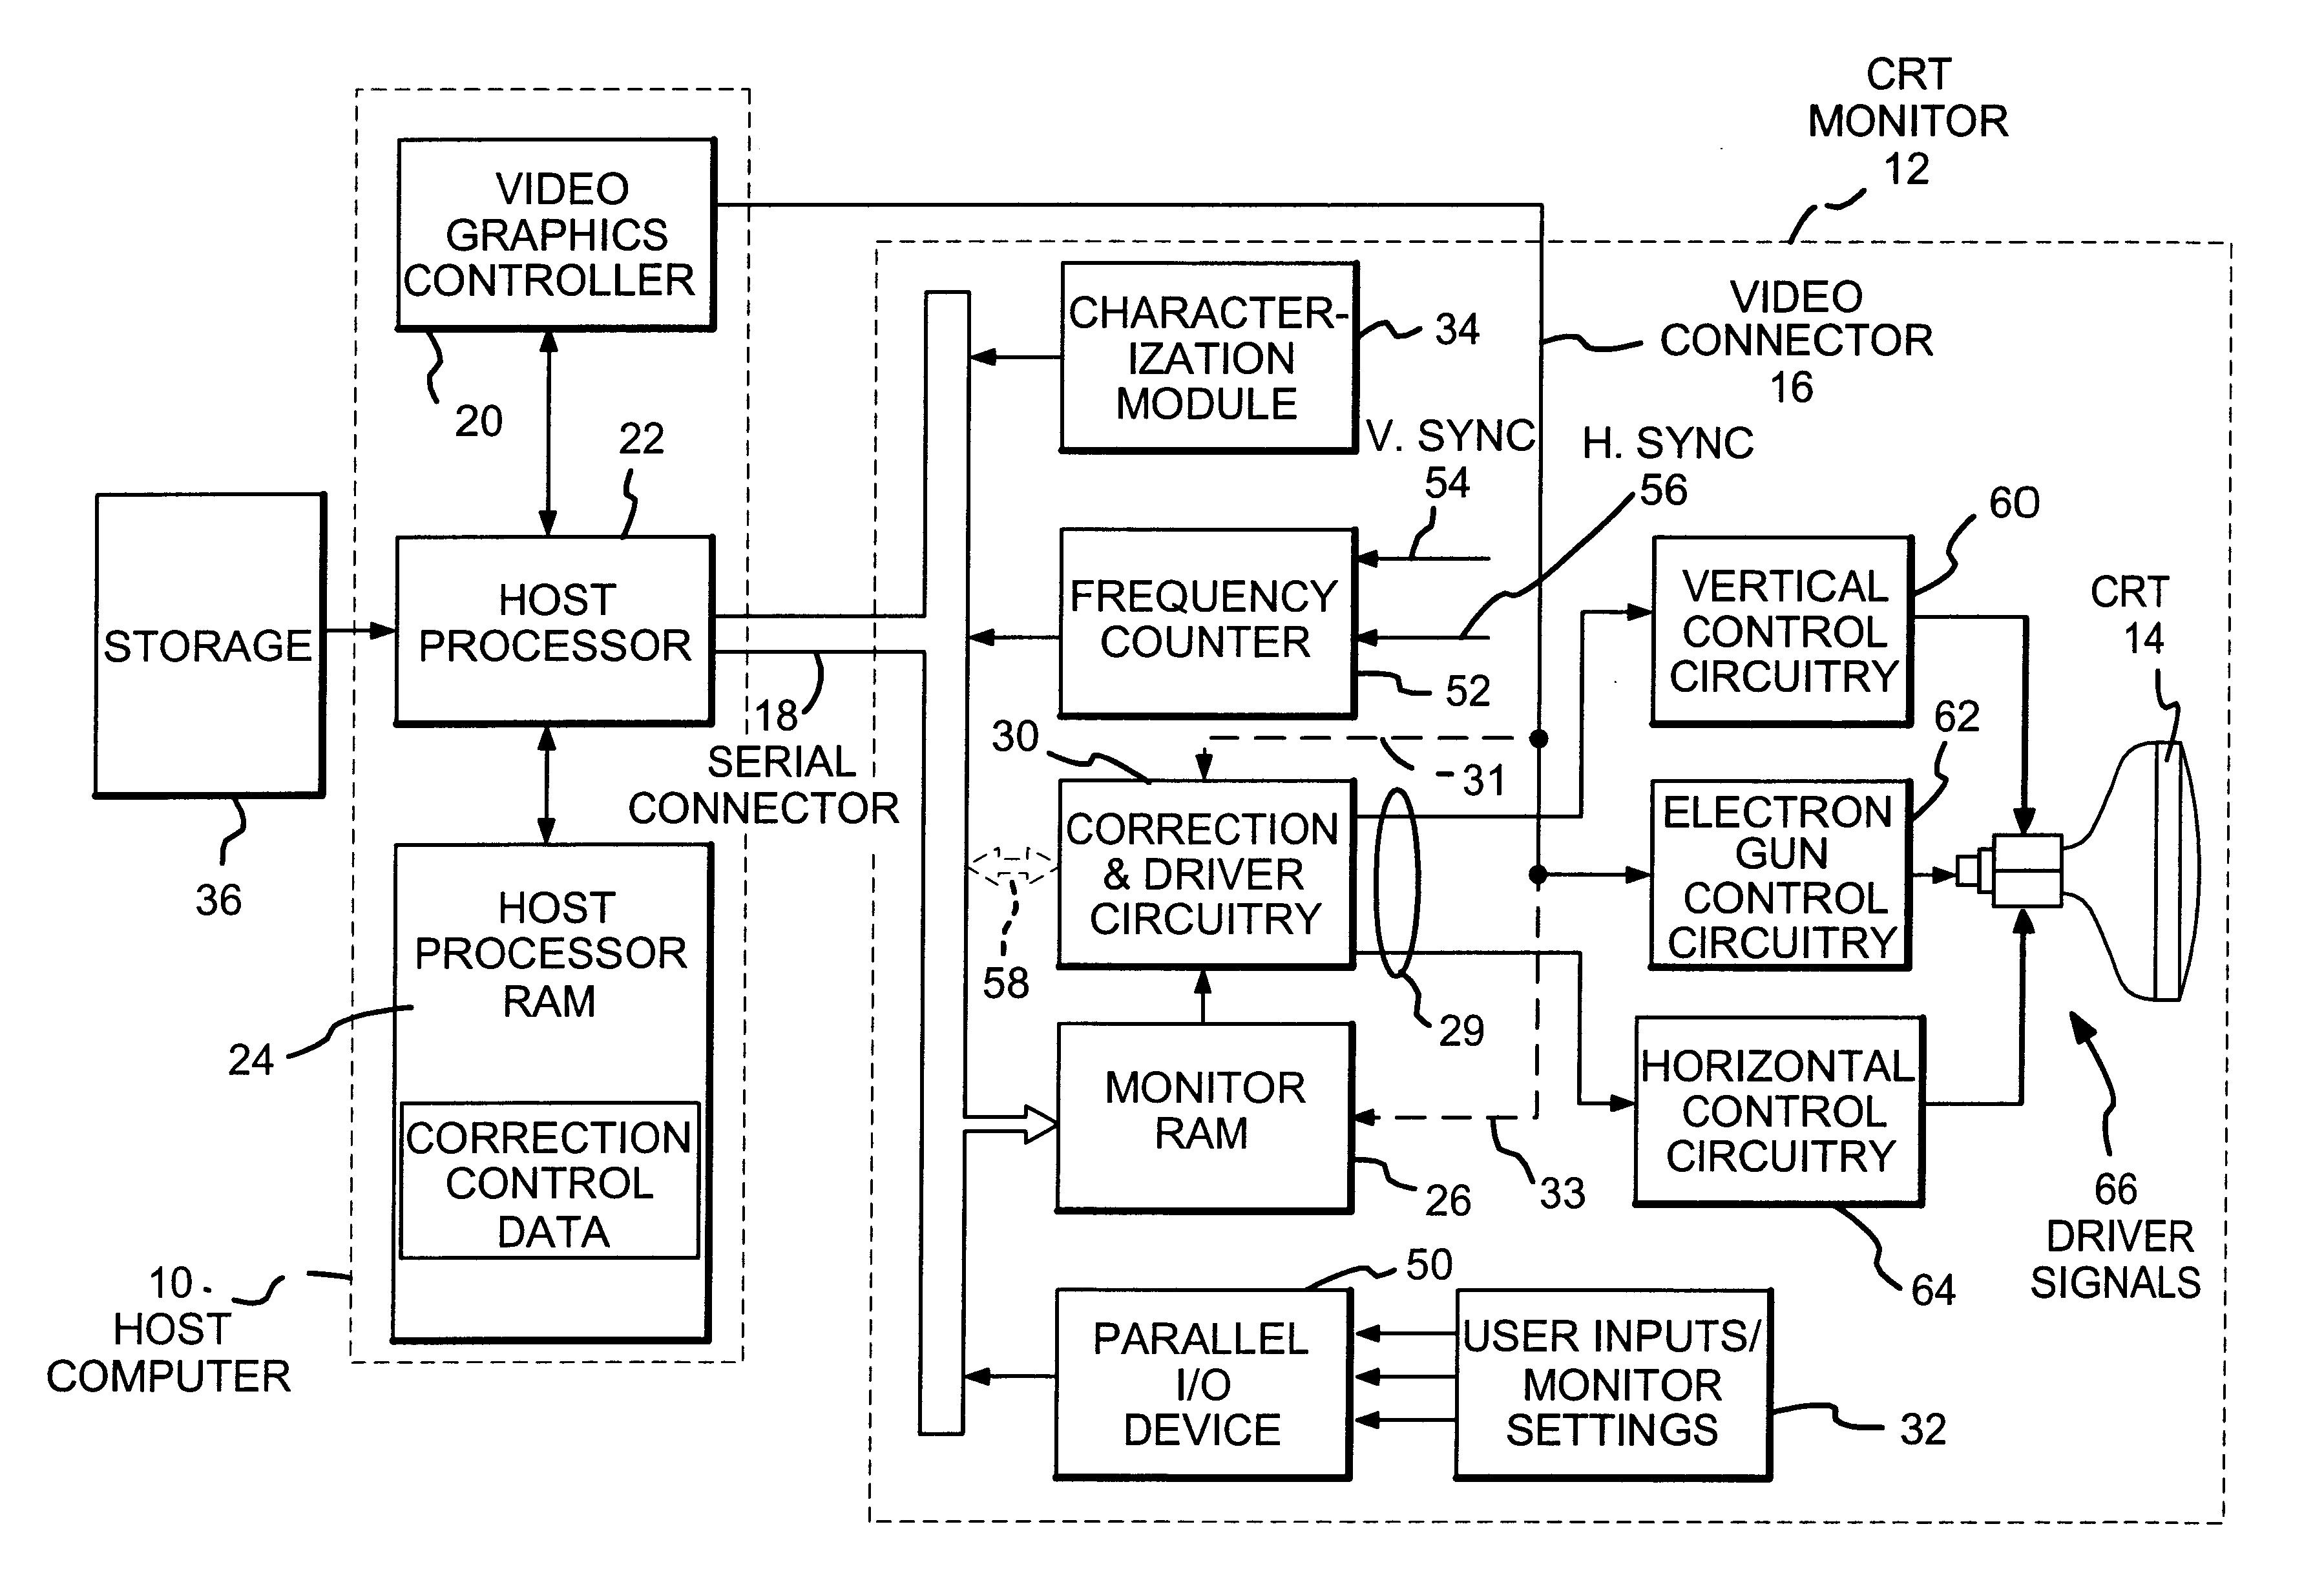 hight resolution of crt wiring diagram wiring diagram centre crt monitor wiring diagram component crt block diagram g6 electronics